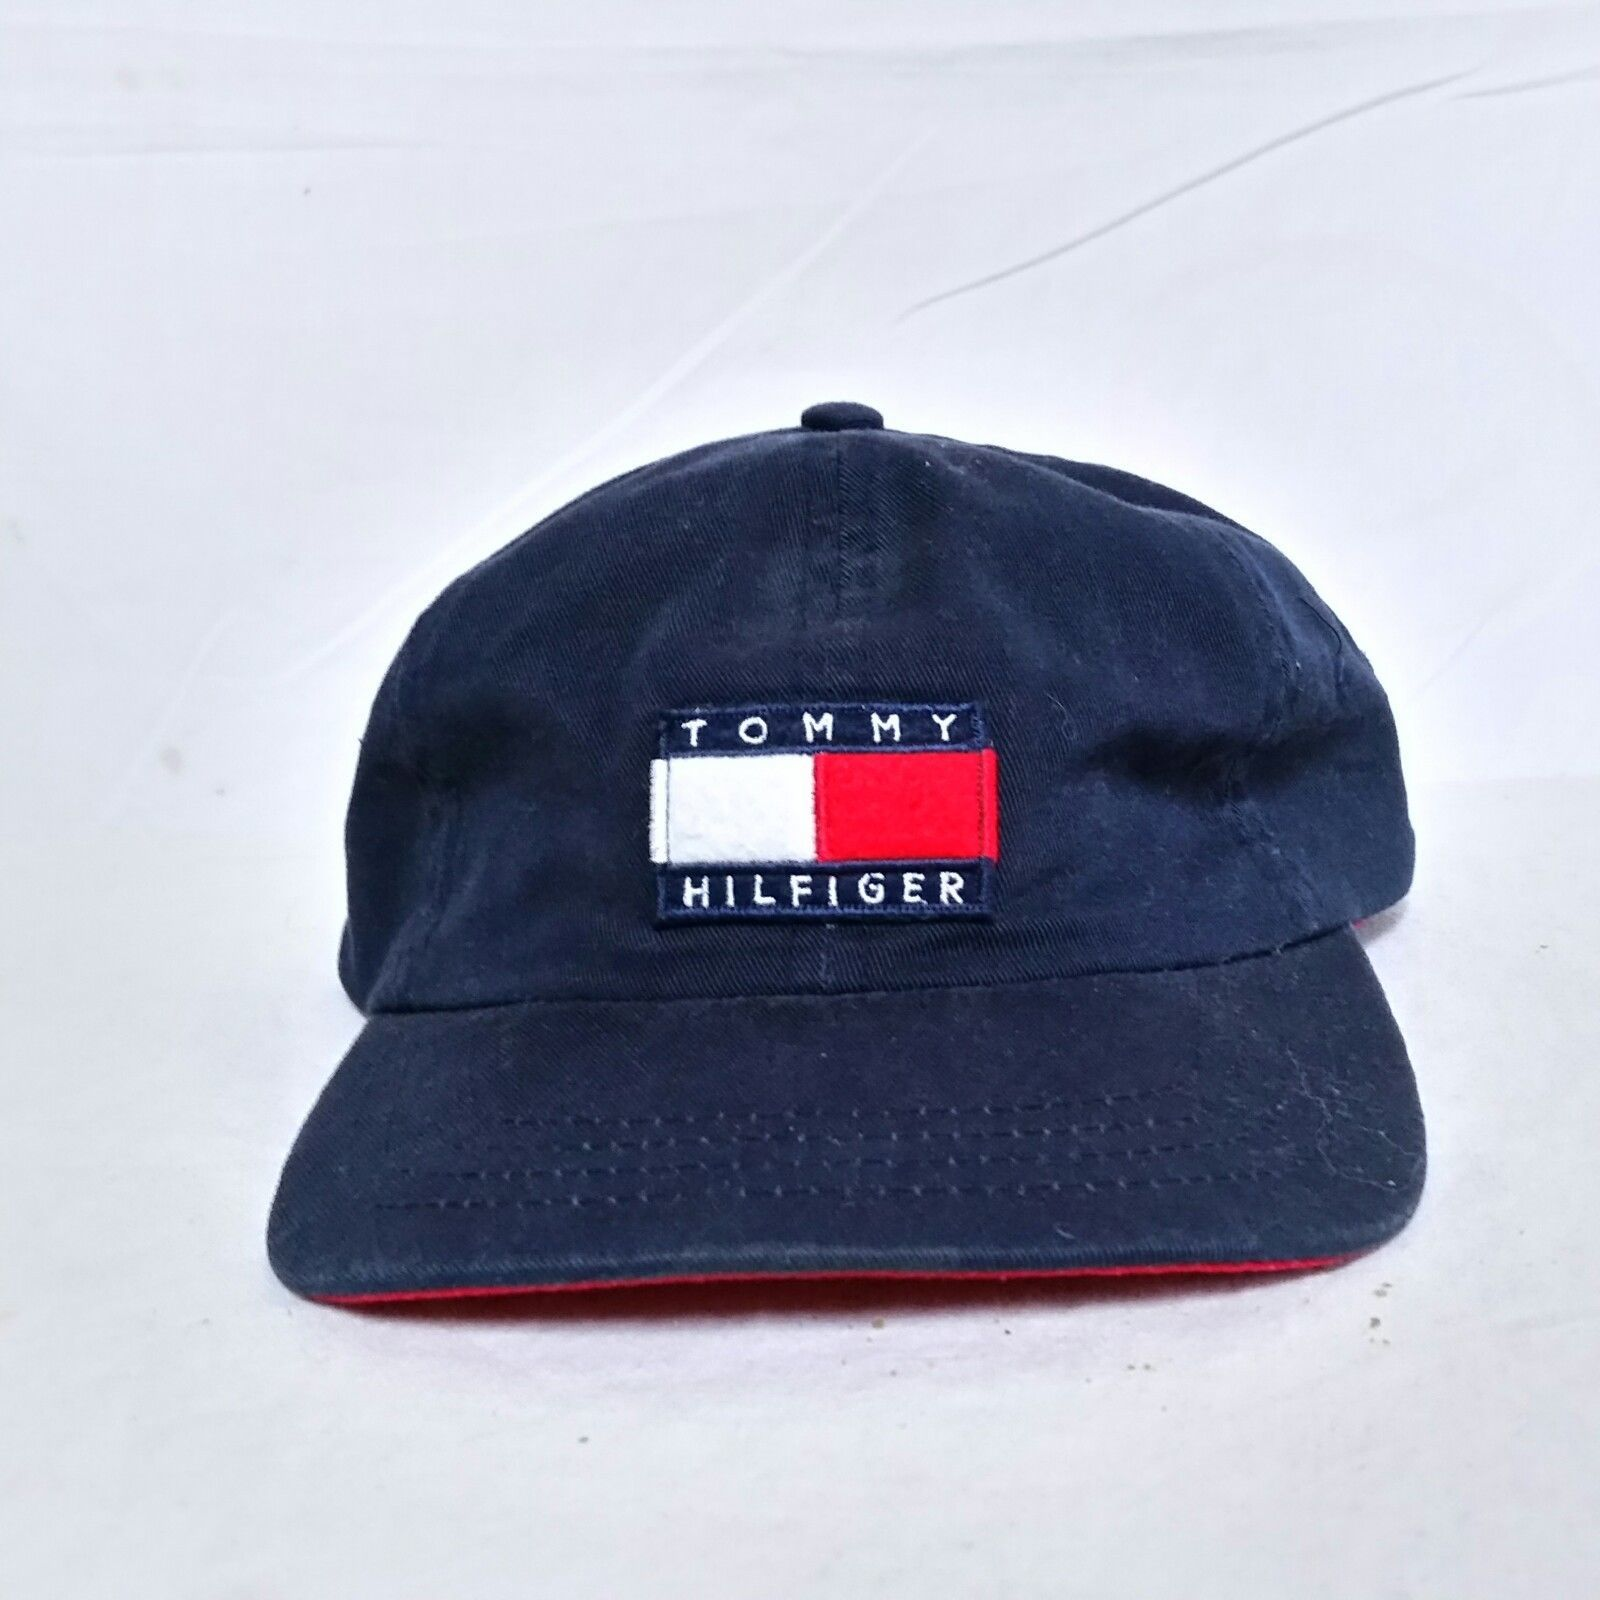 698ef56c S l1600. S l1600. Previous. VTG Tommy Hilfiger Snapback Hat Flag 90s Lotus  Sailing Cap Spell Out Baseball